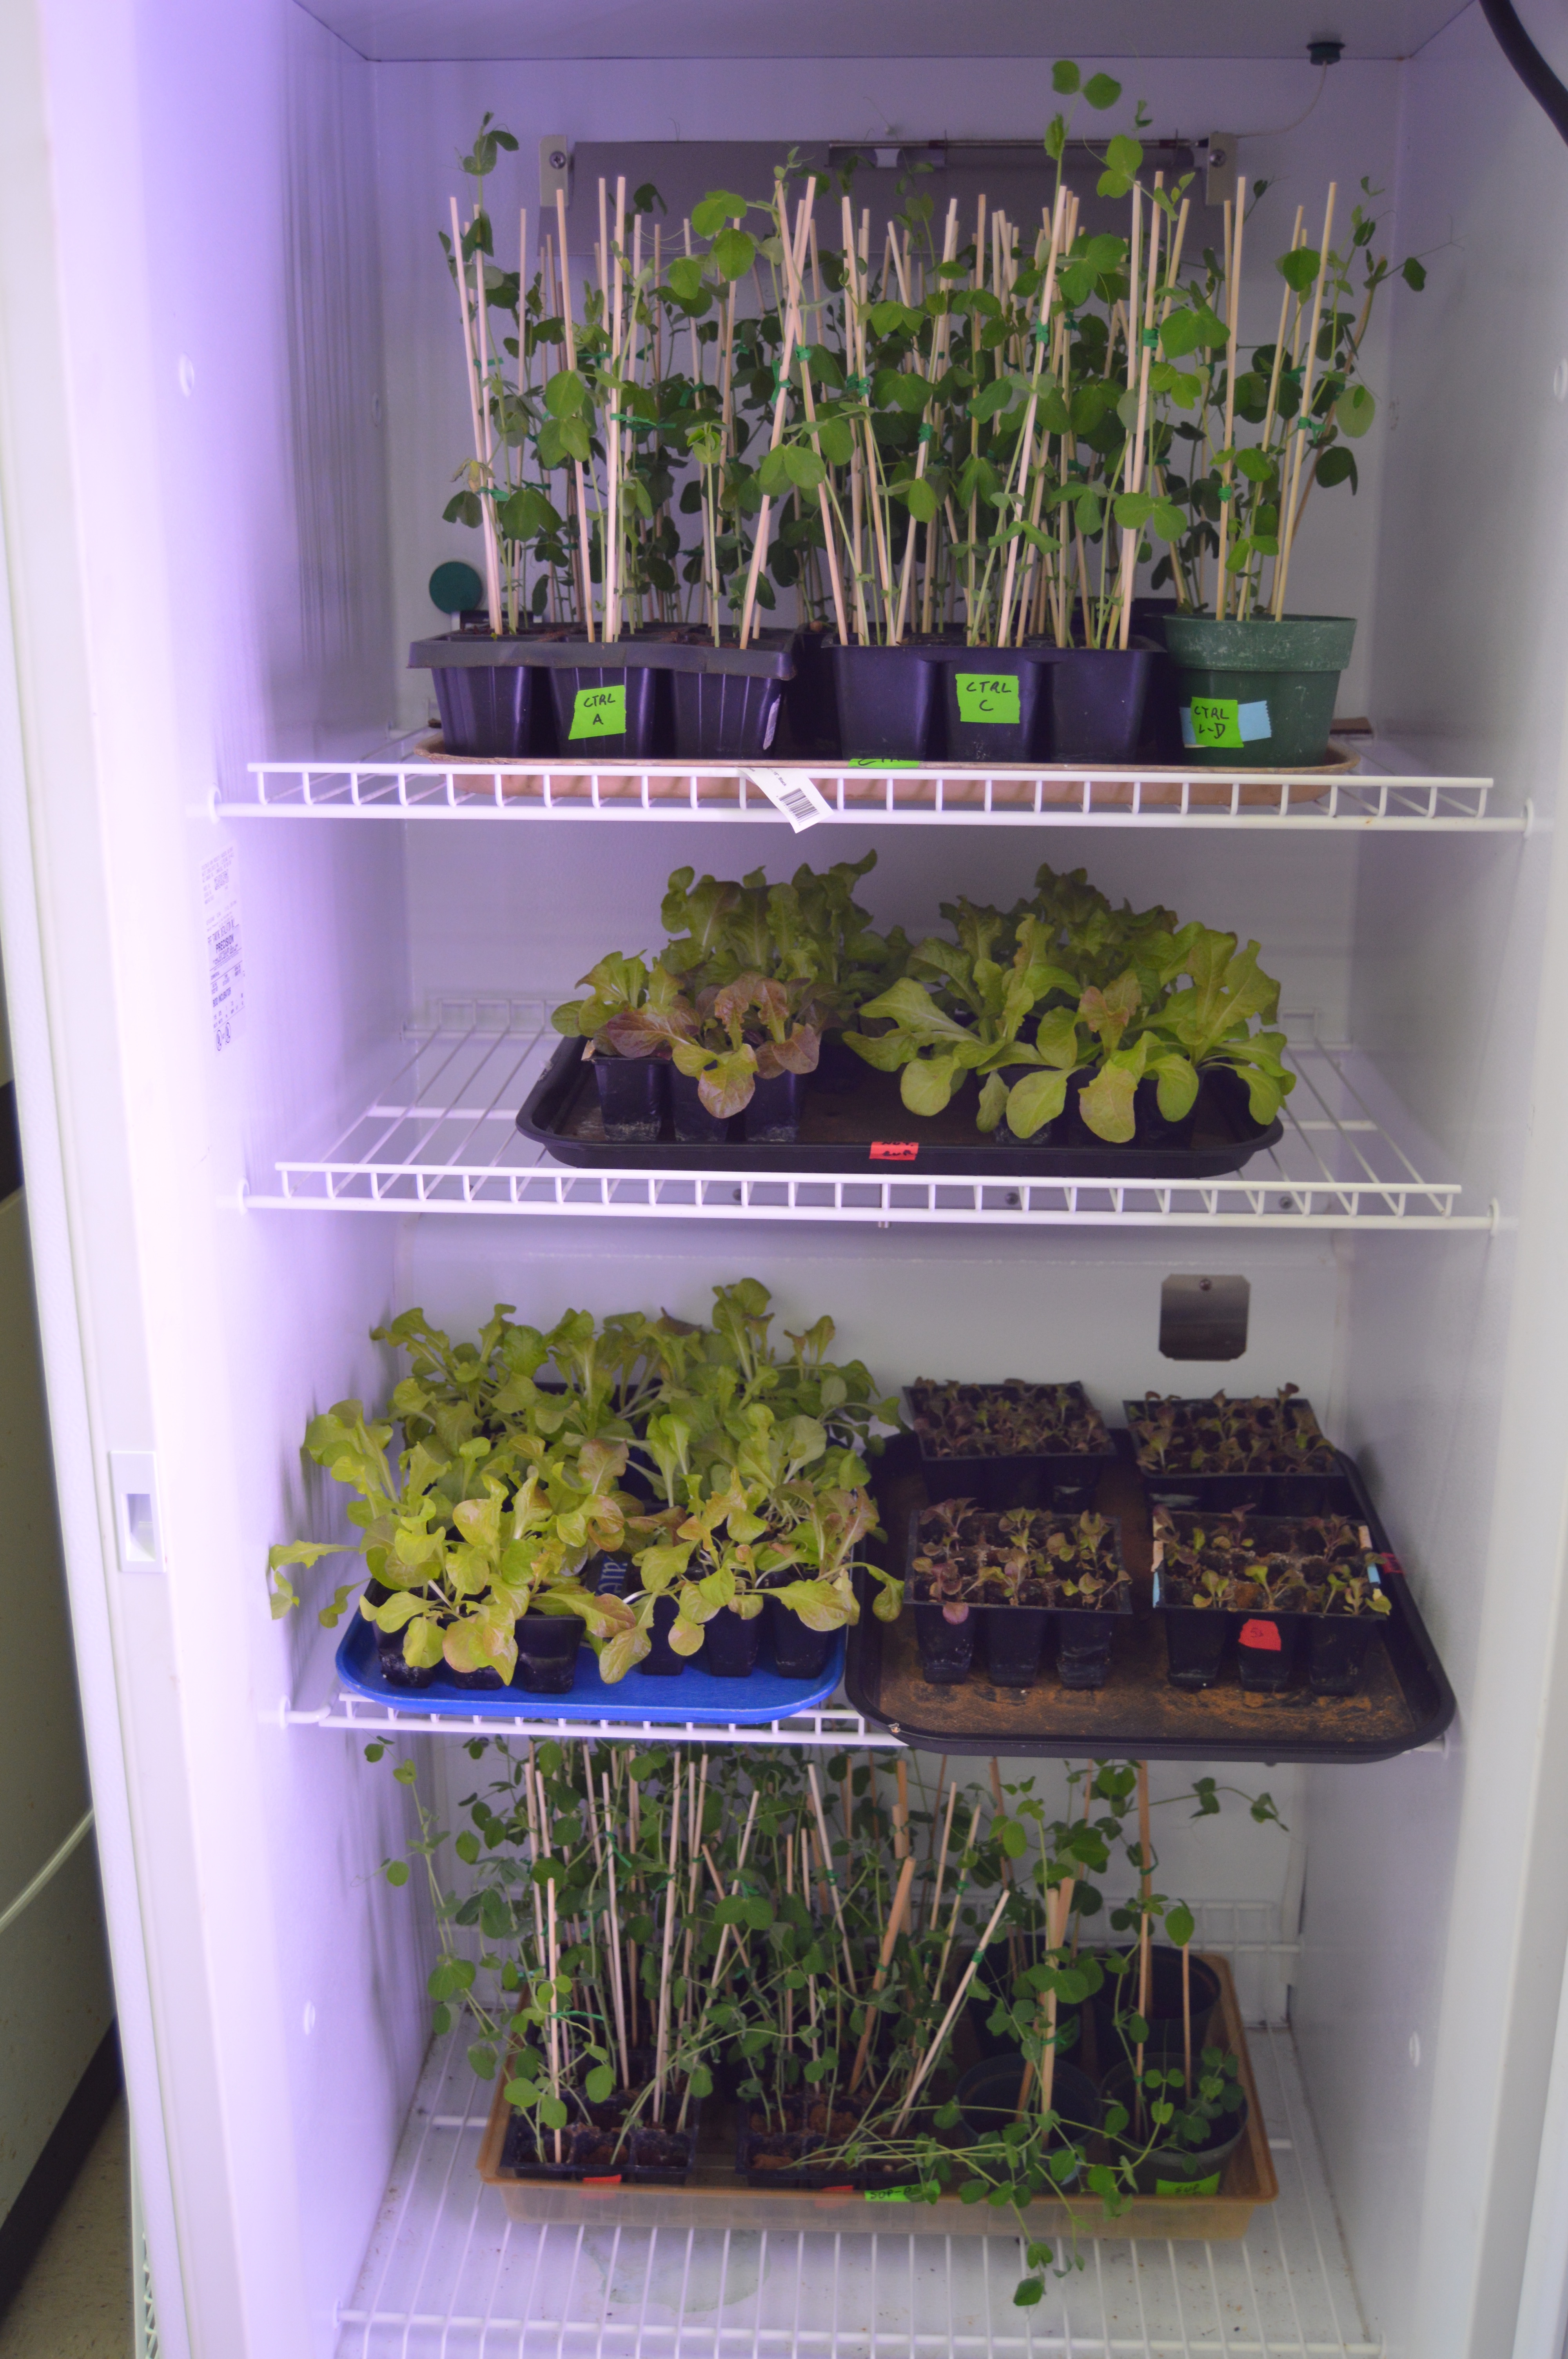 The Florida Tech Mars Garden growing chamber